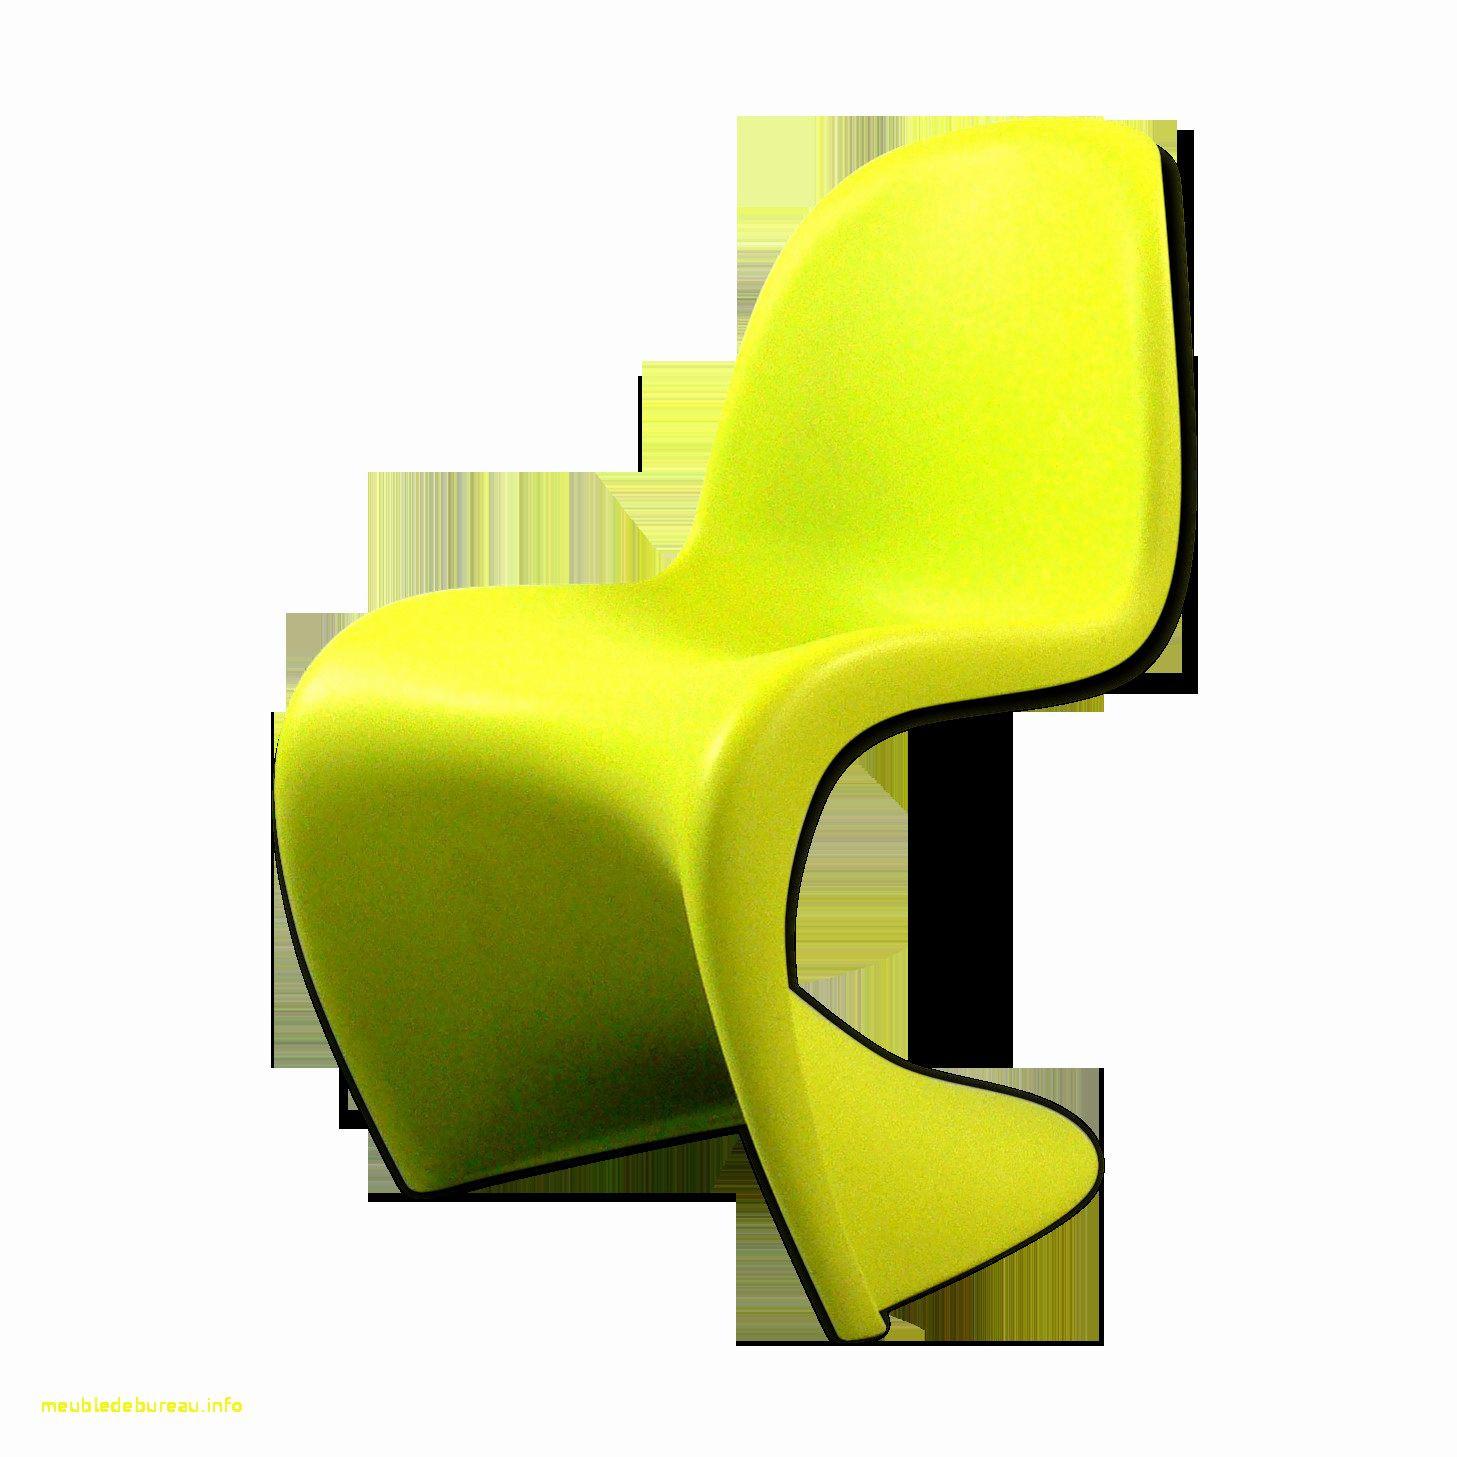 magasin meuble design magasin 3 distri en allemagne meuble de elegant moteur 0d meubles n0opwk of magasin meuble design